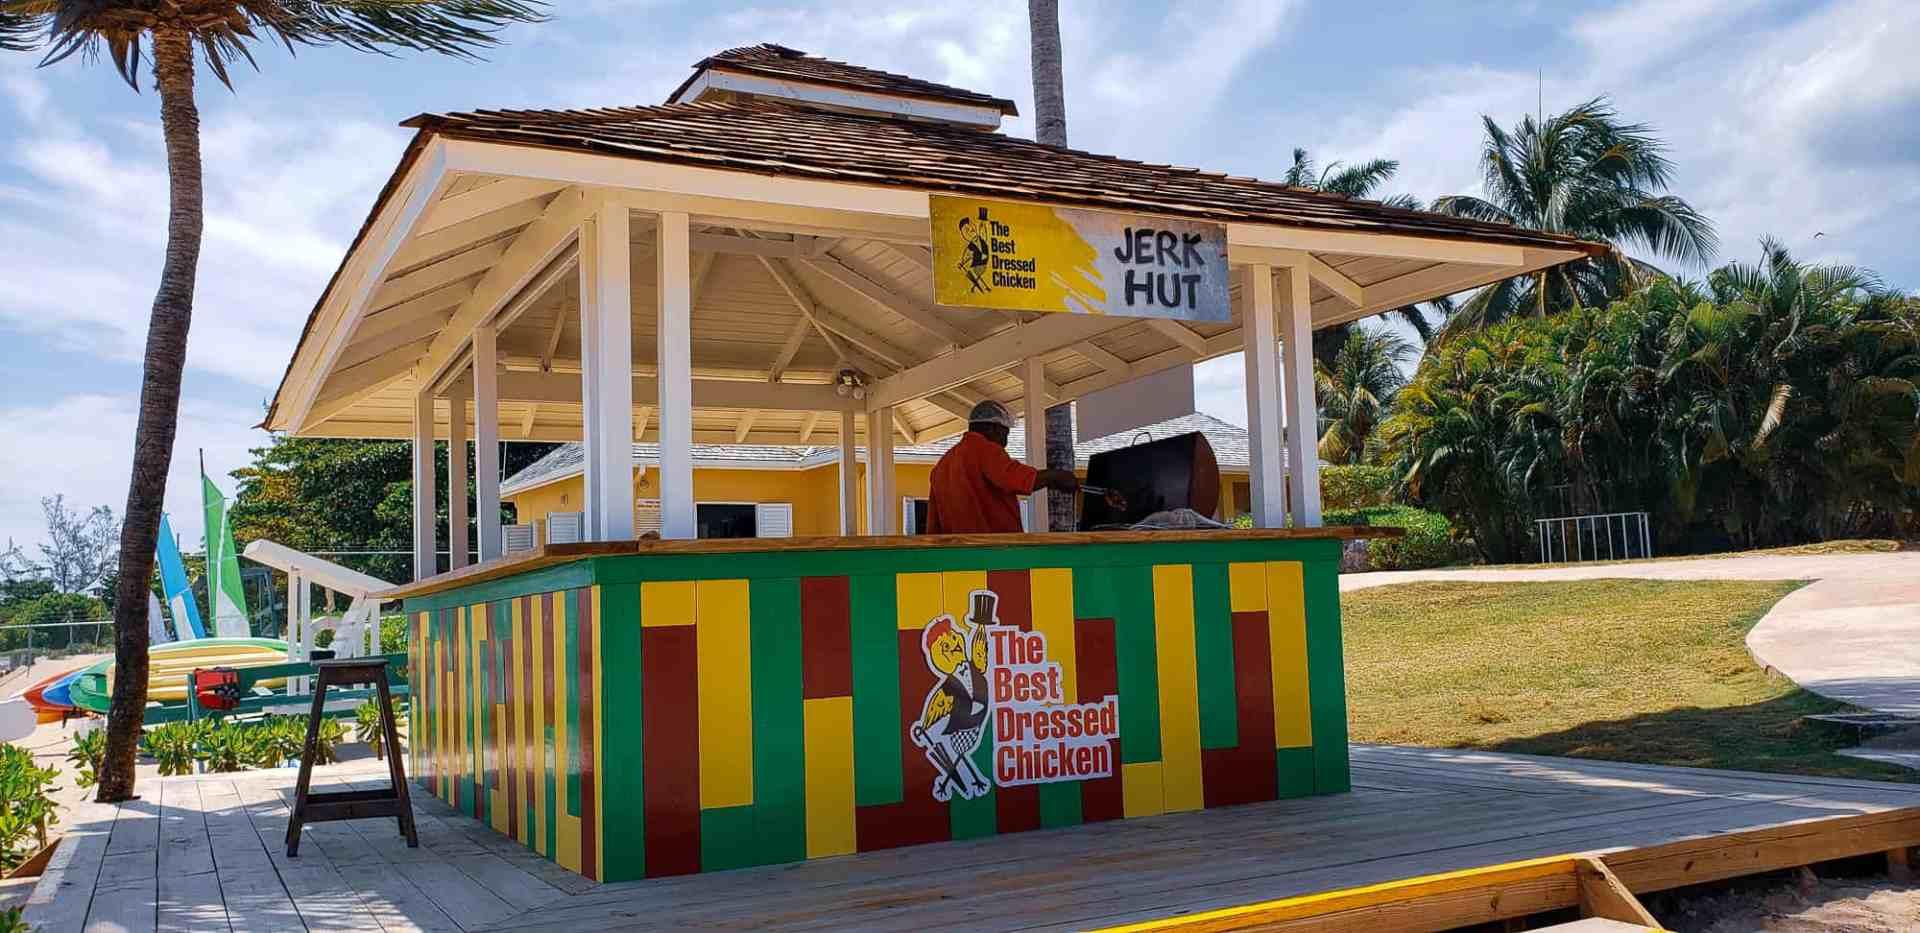 MSC Seaside Family Cruise: Day 3 - Ocho Rios, Jamaica